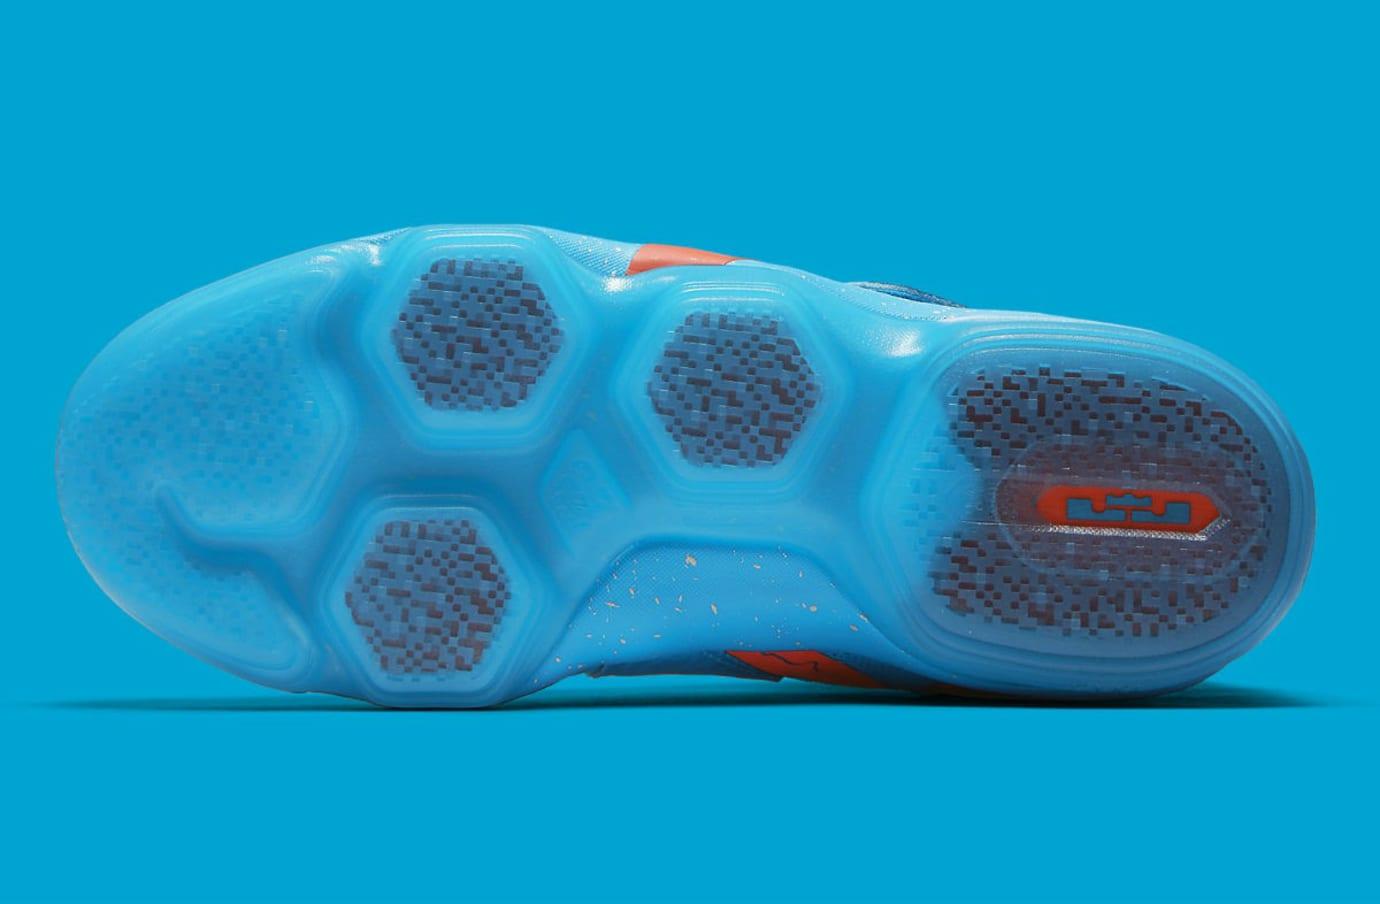 cheaper 2f229 2ecbb Nike LeBron 14 GS Cocoa Beach Release Date Sole 859468-477